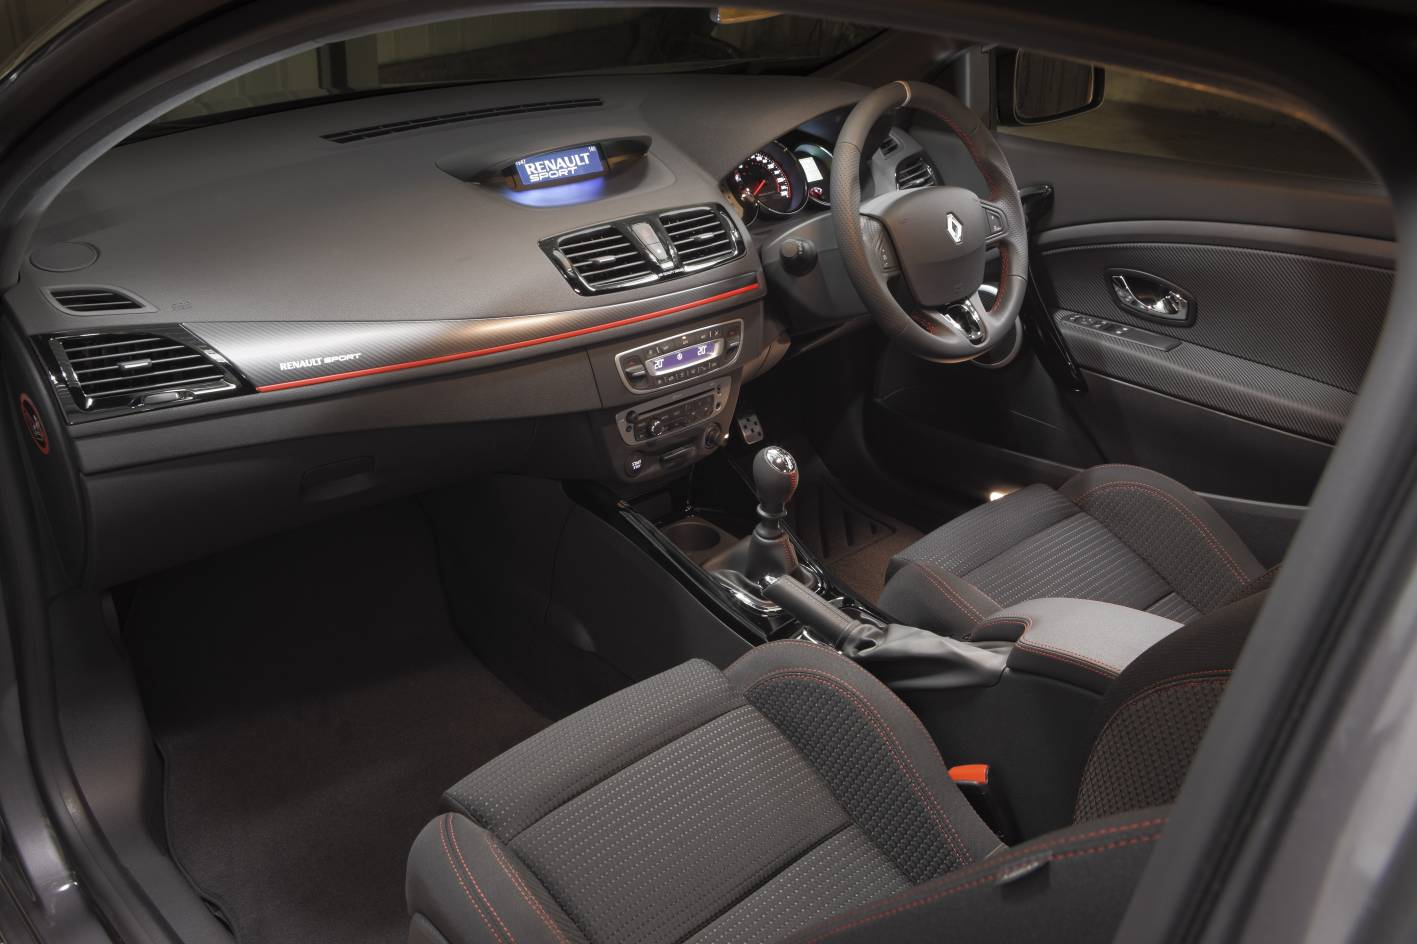 Renault Megane rs 265 Interior 2015 Renault Megane rs 265